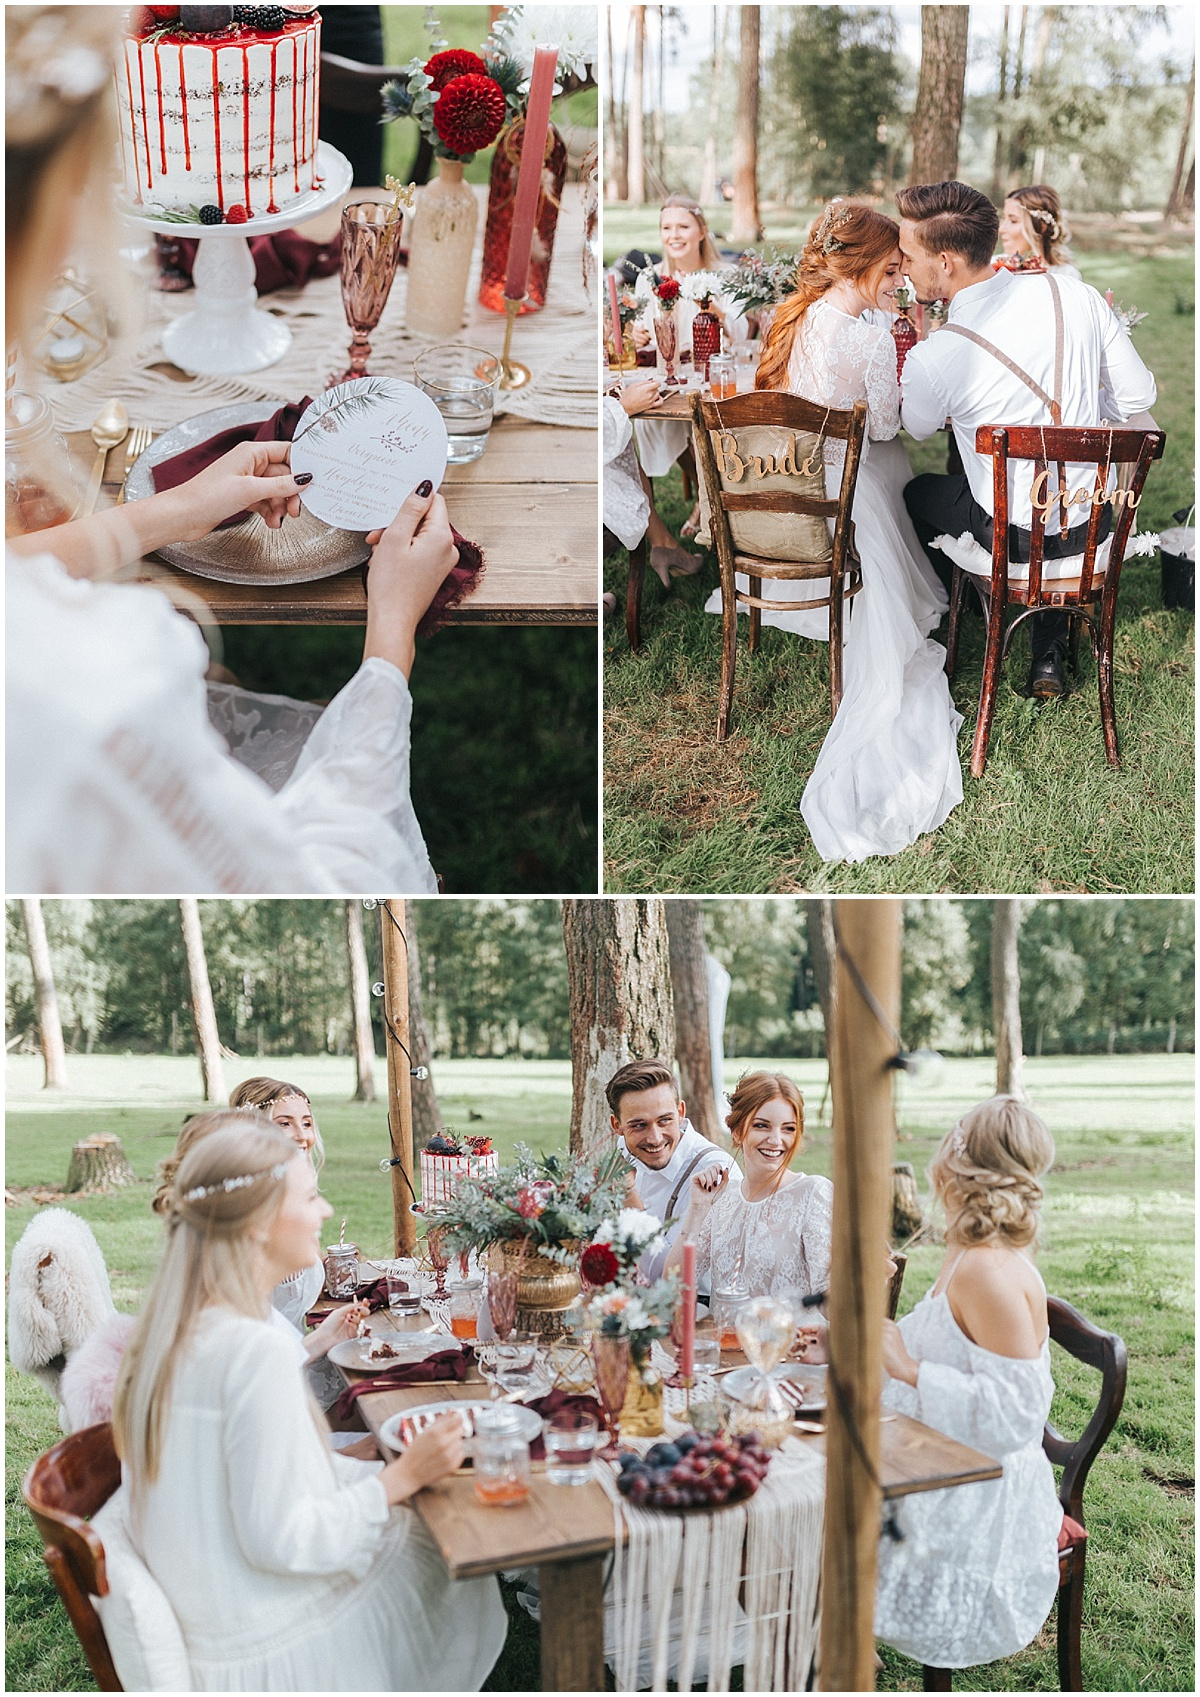 Marrymag Boho Hochzeit Im Wald Outdoor Location